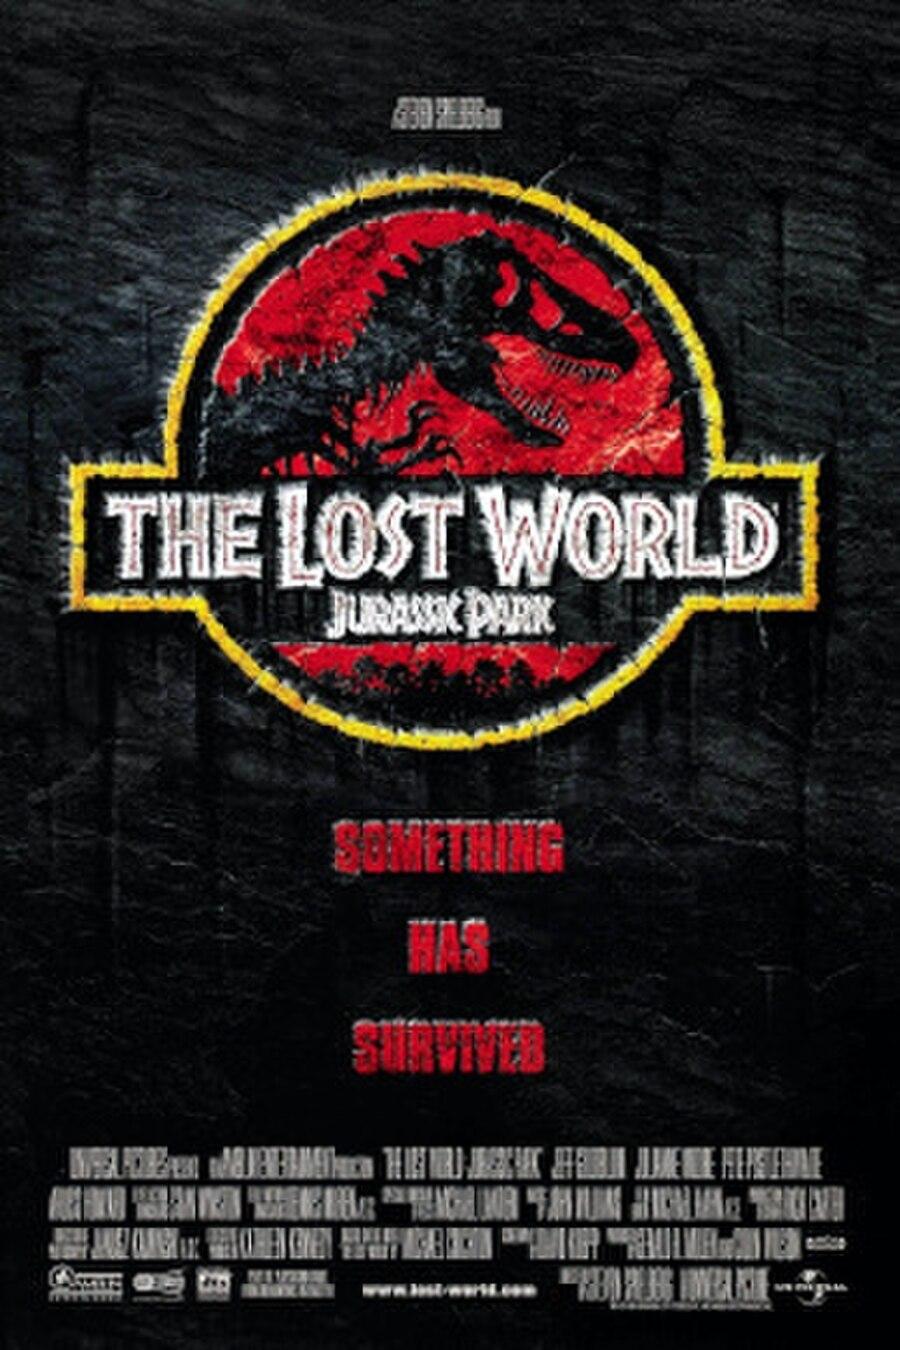 The Lost World: Jurassic Park